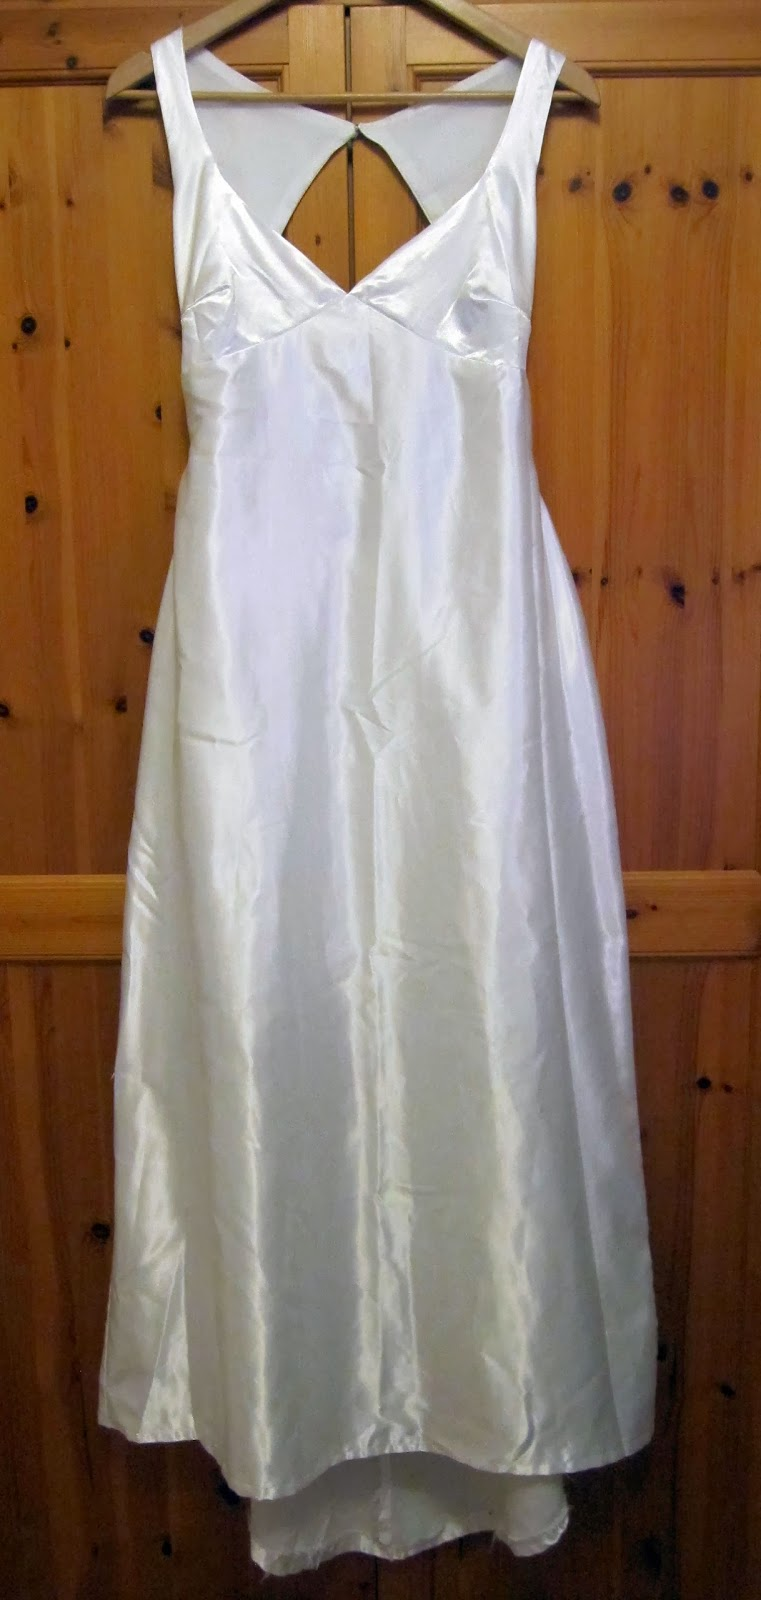 Hips too big for wedding dress